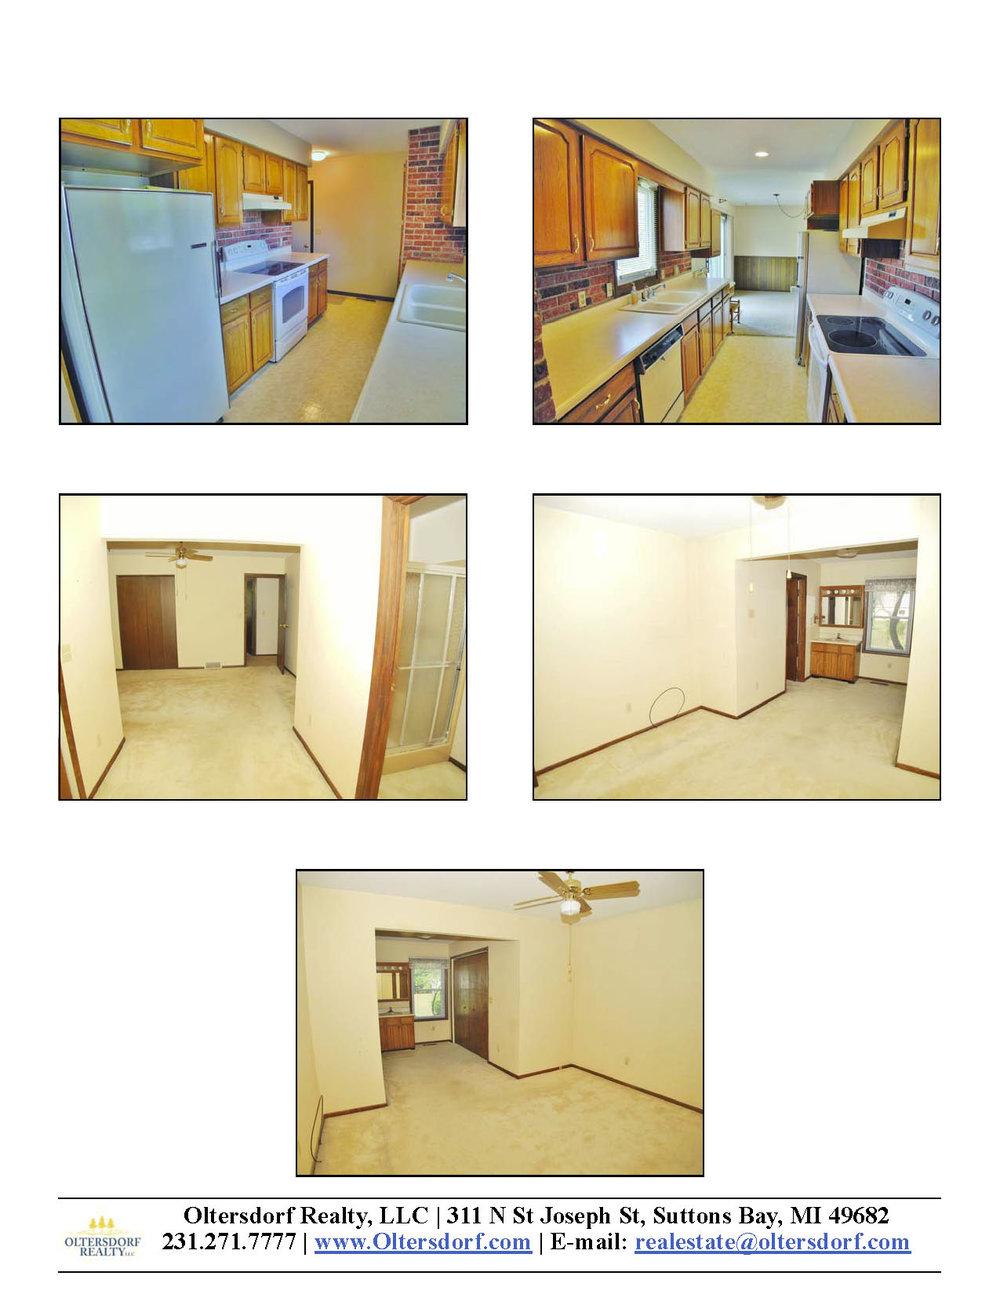 4903 Waldon Circle, Traverse City, MI – 3 Bedroom & 2 Bath Ranch Home for sale by Oltersdorf Realty LLC marketing packet (4).jpg